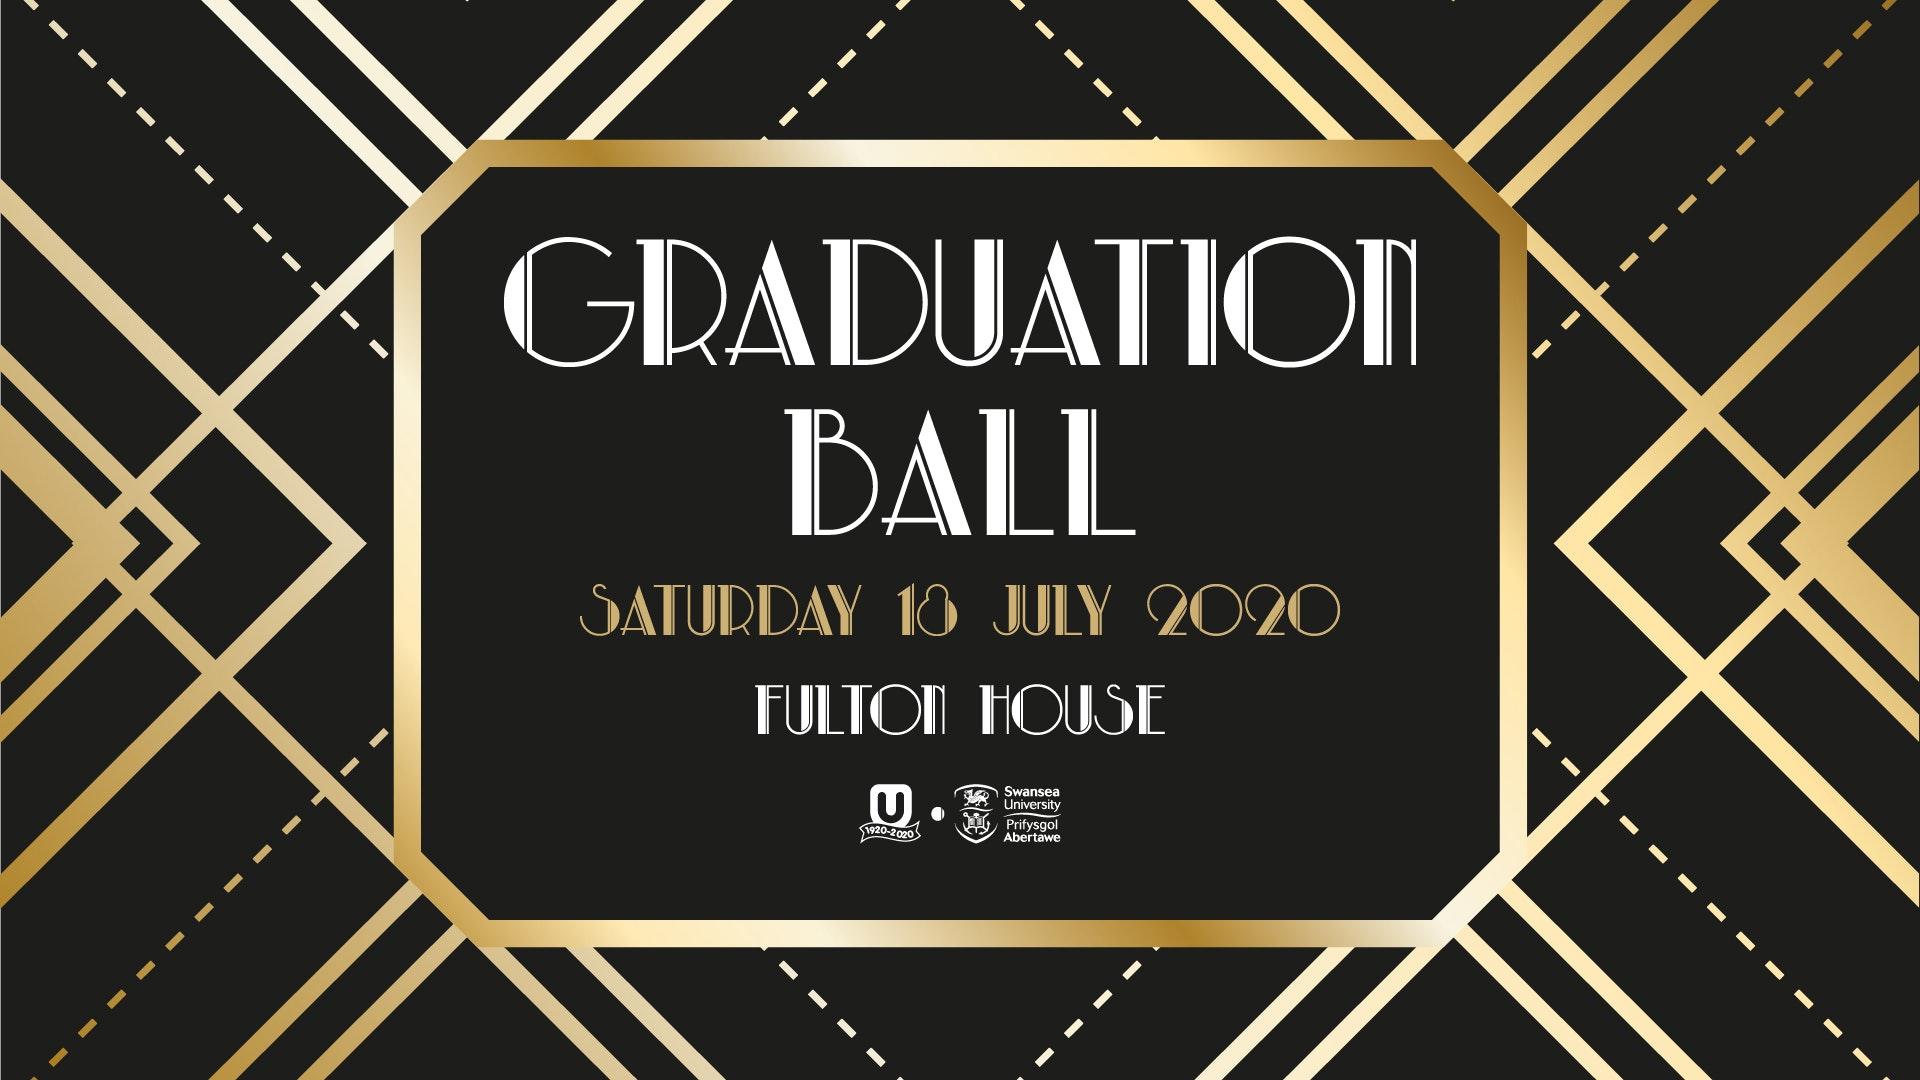 Graduation Ball 2020